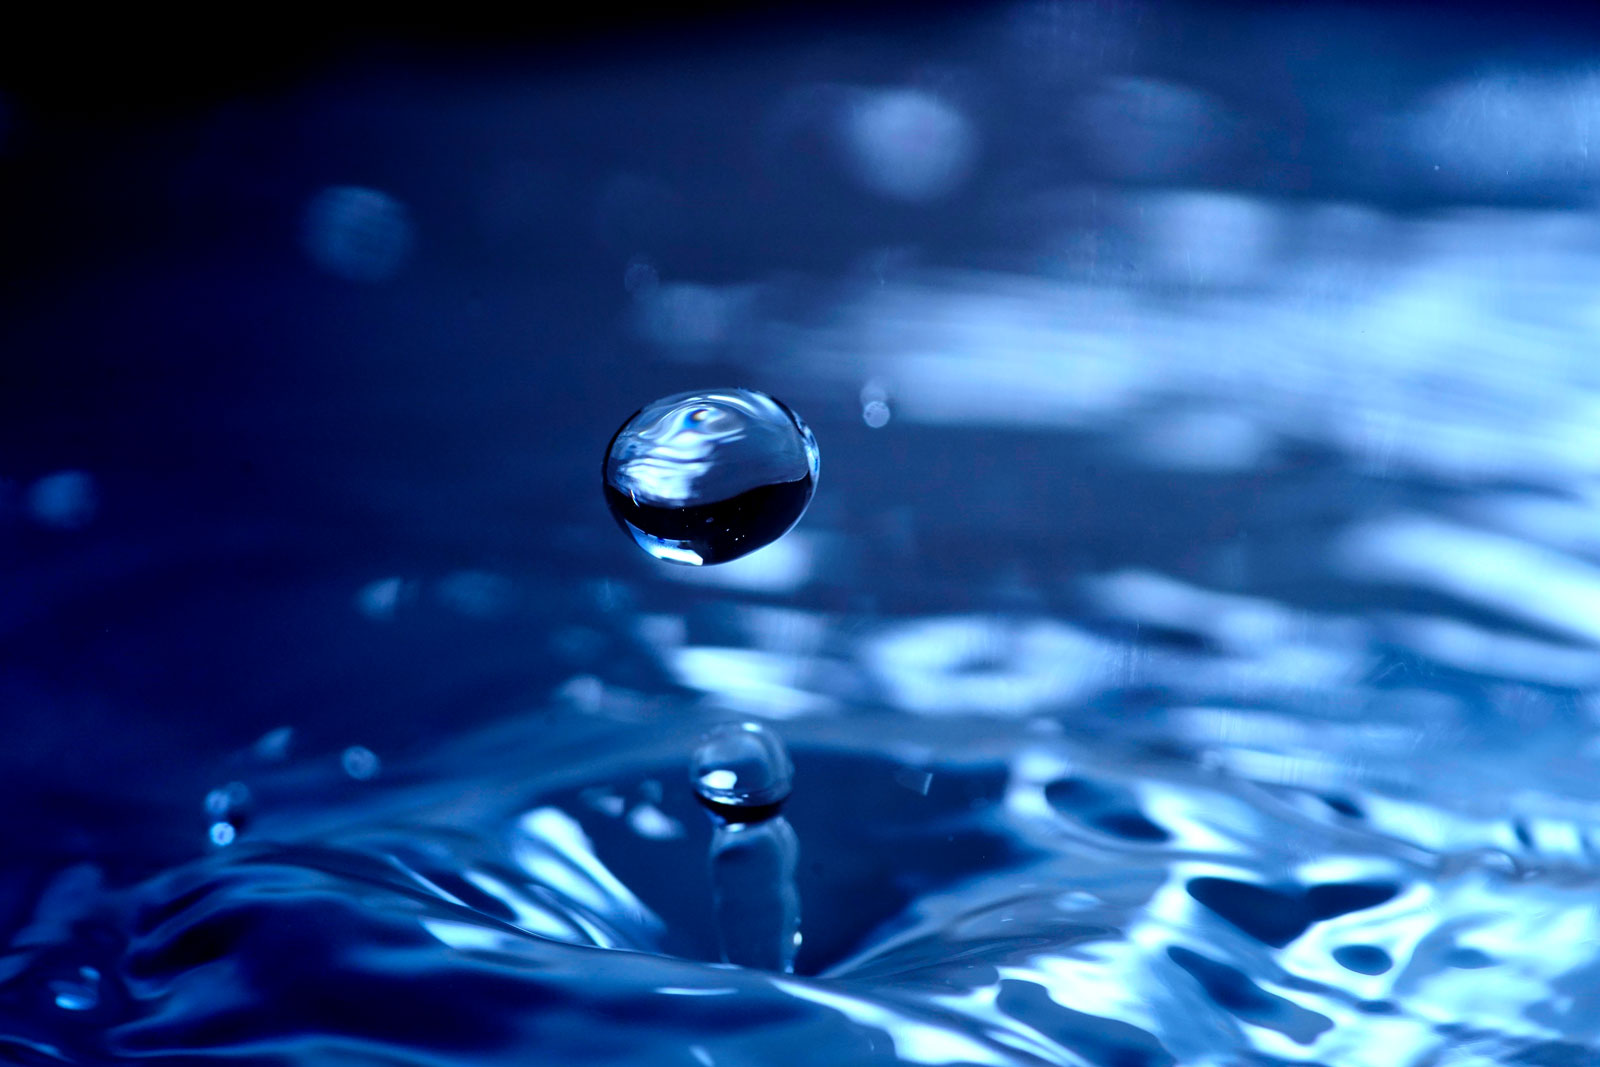 Fotografia Toshiya Ogawa - kropla wody